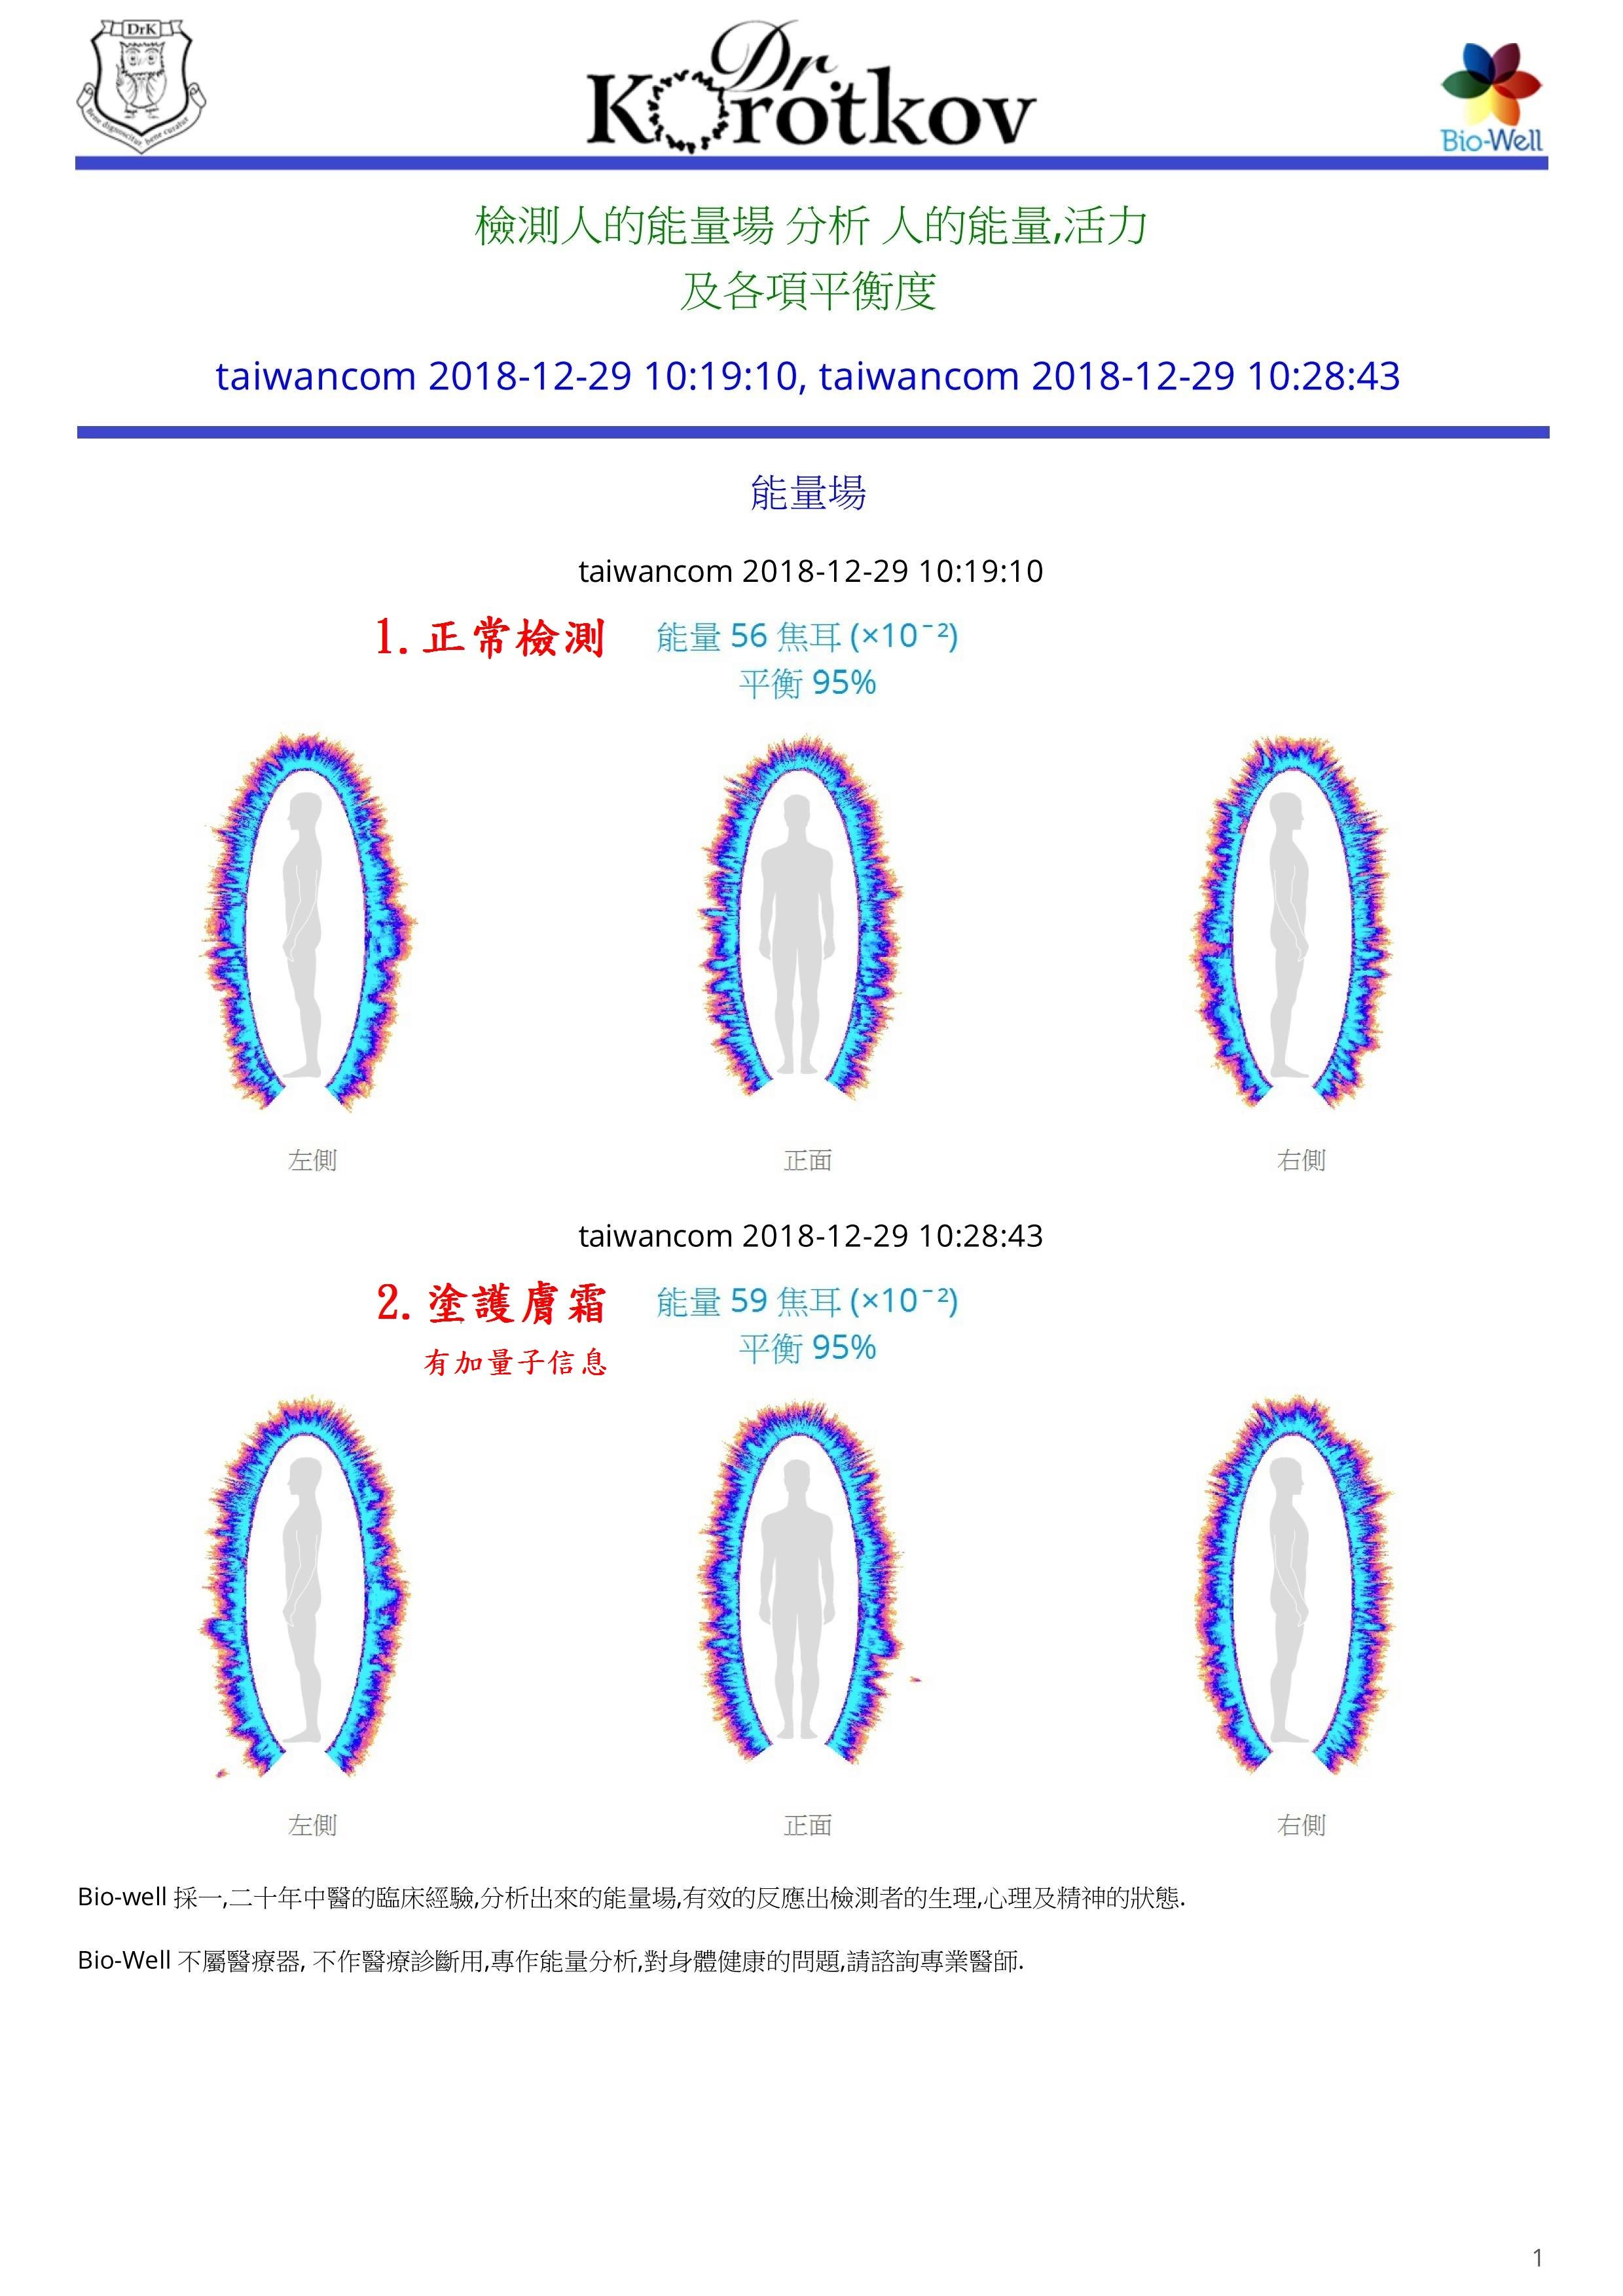 http://taiwancom.tw/images/bio-6-3.jpg